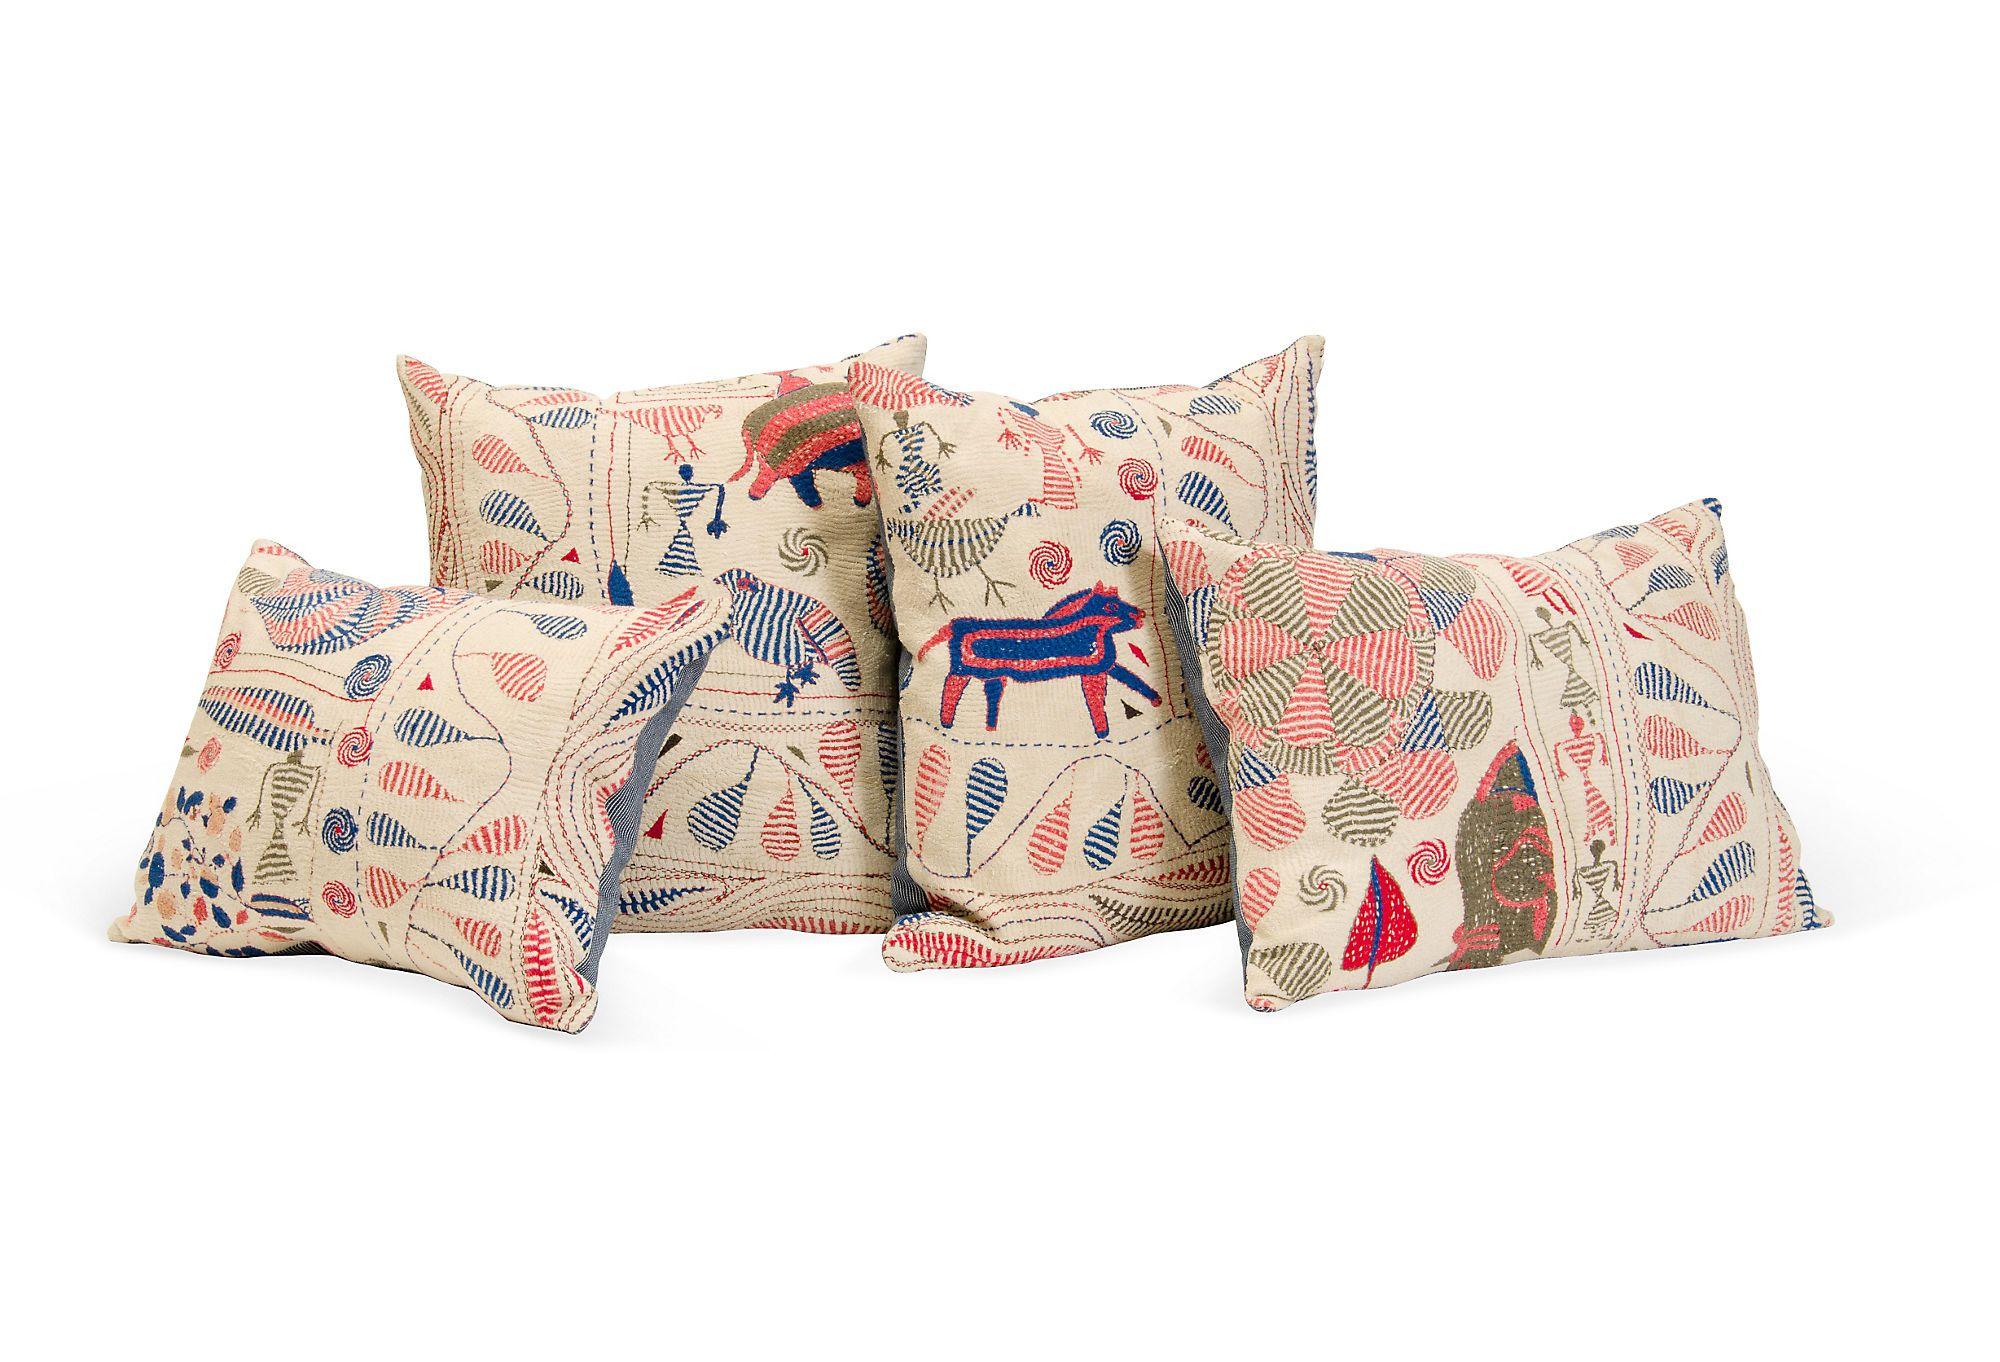 Vintage Kantha Quilt Pillows